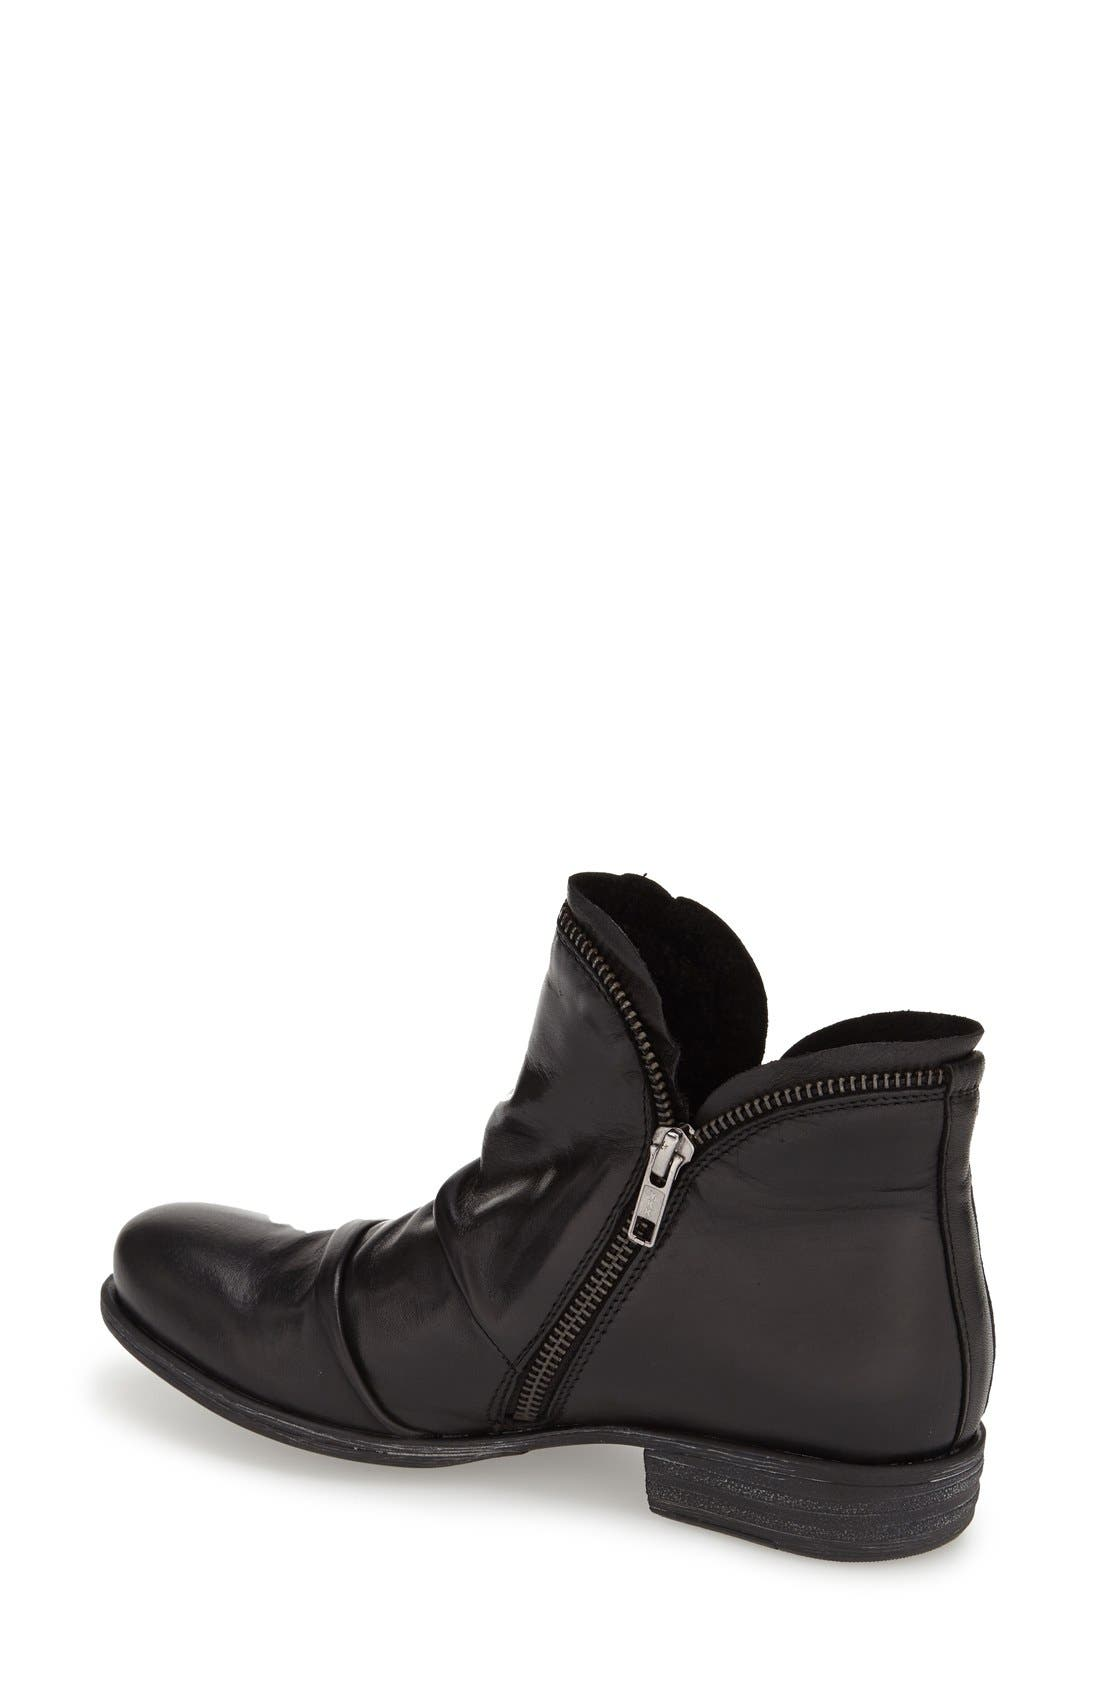 'Luna' Ankle Boot,                             Alternate thumbnail 2, color,                             BLACK